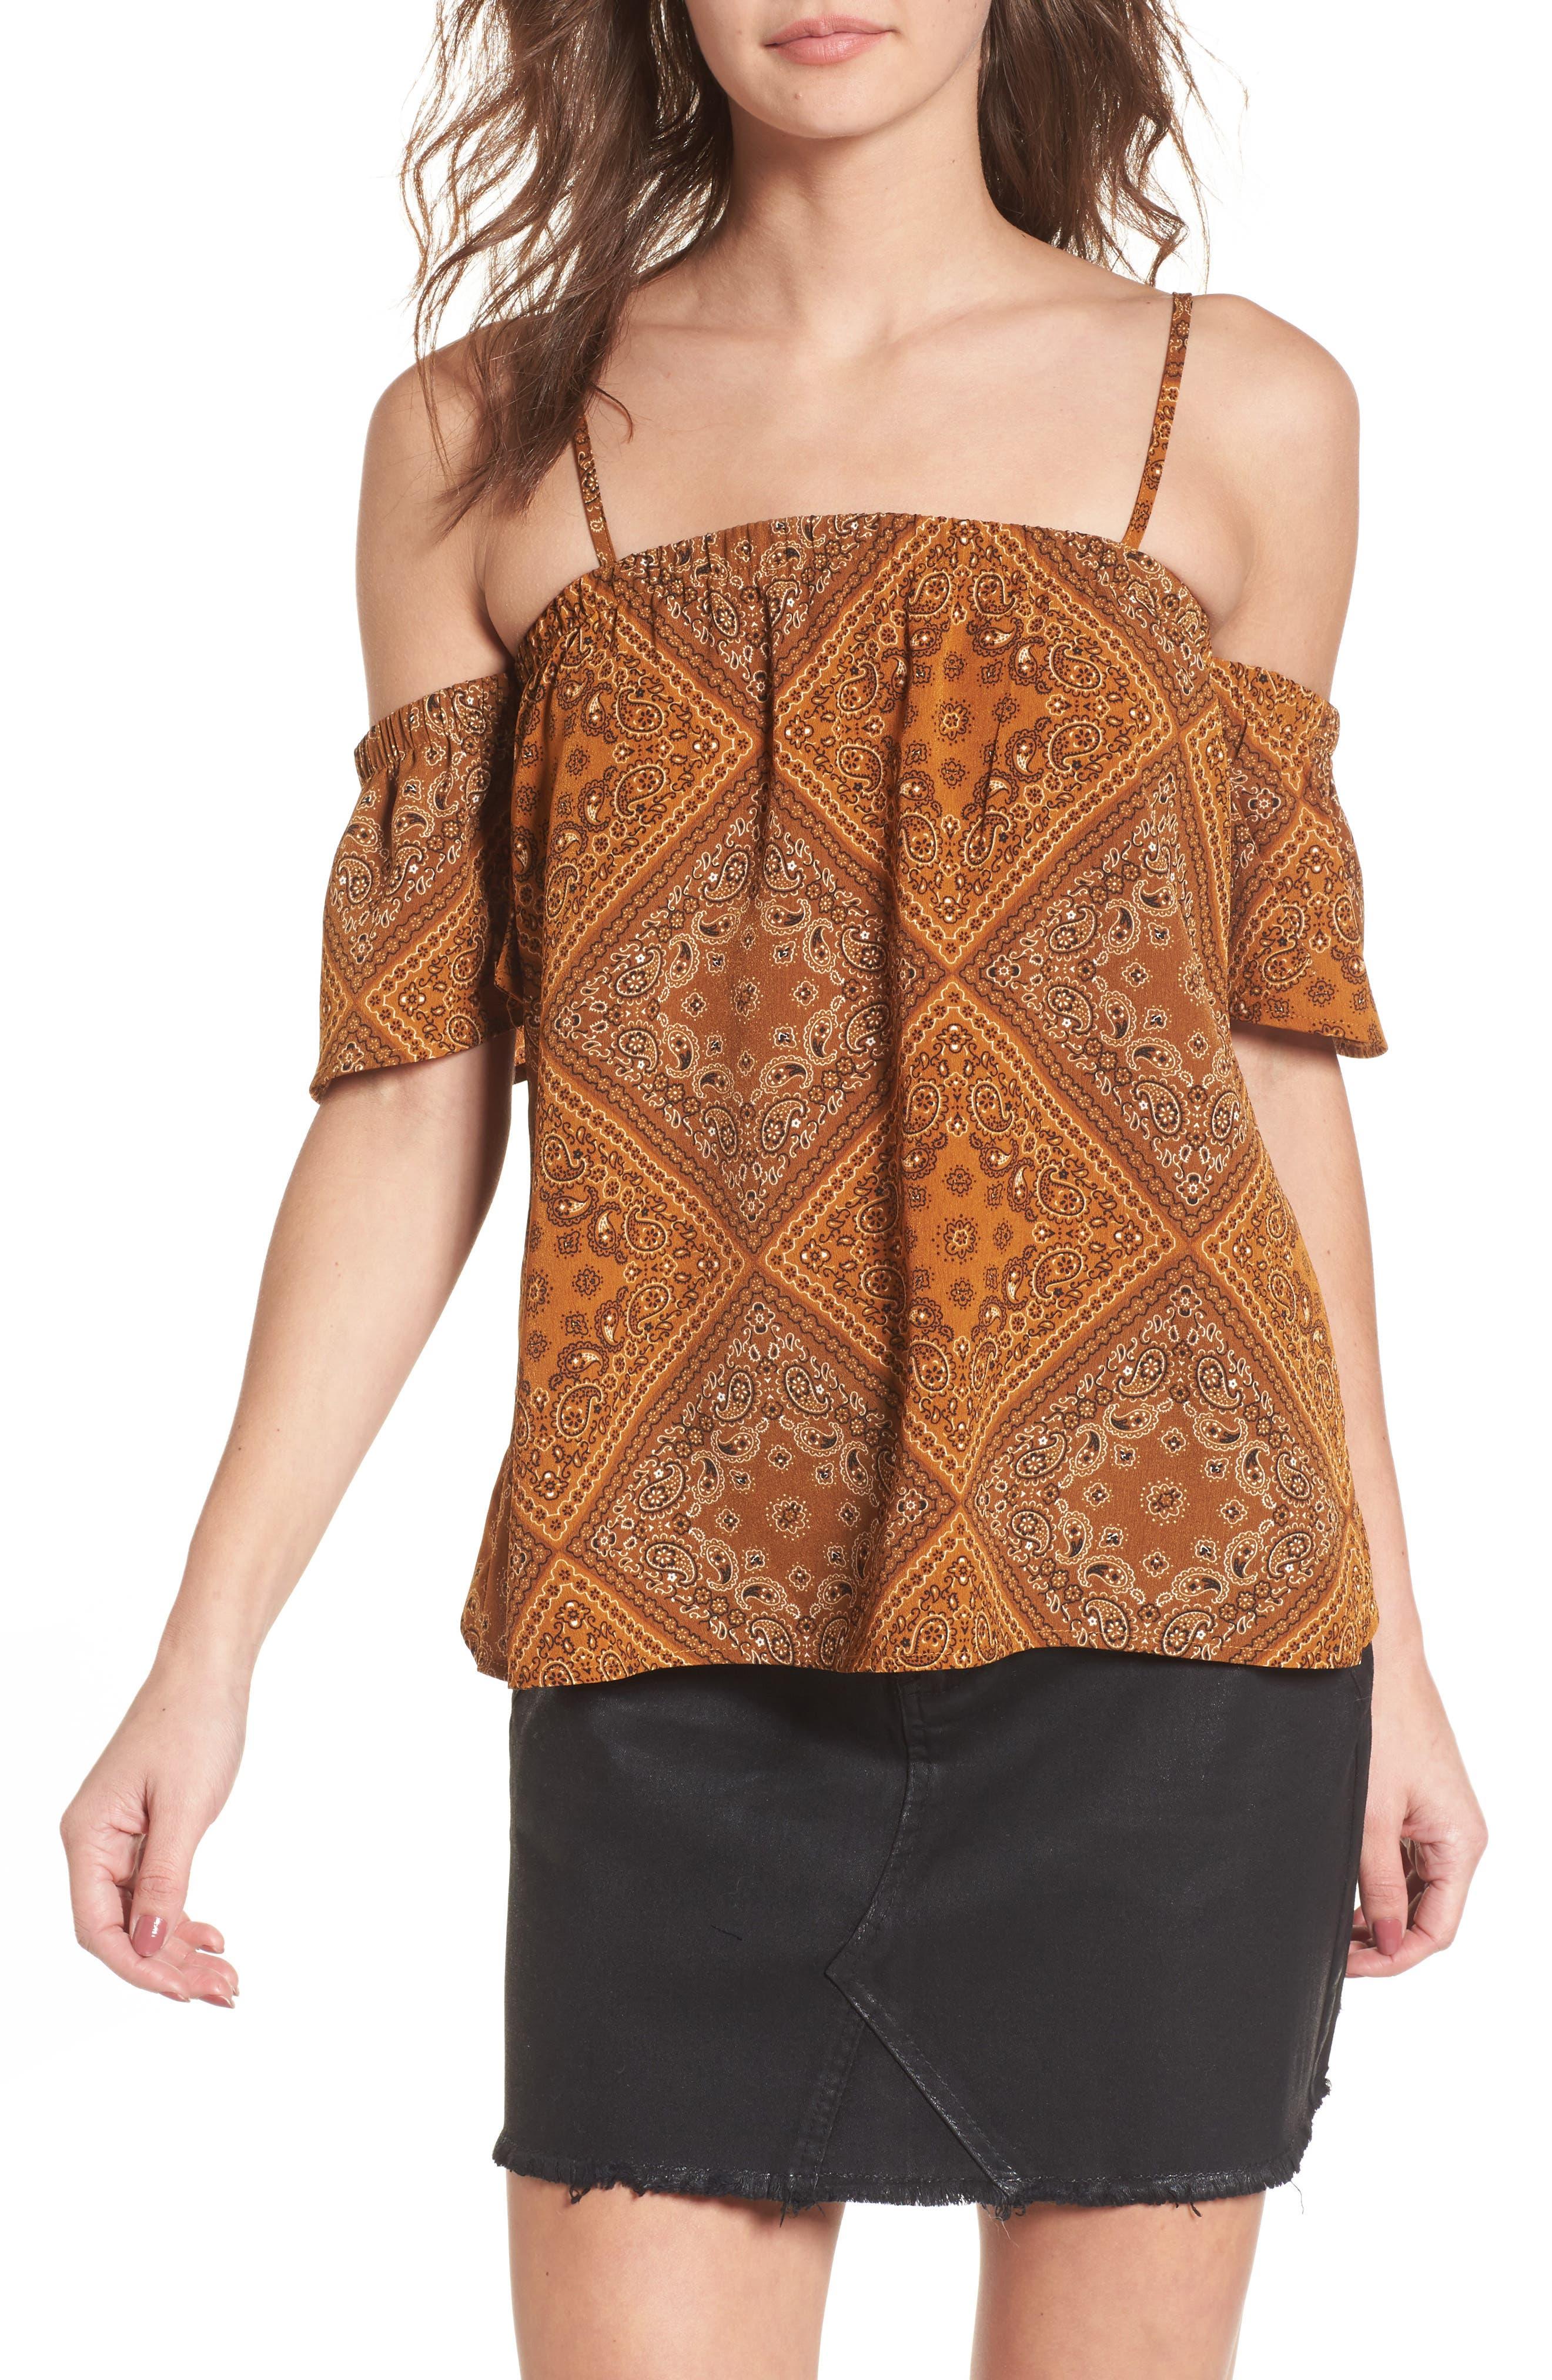 Alternate Image 1 Selected - Lira Clothing Zeze Top